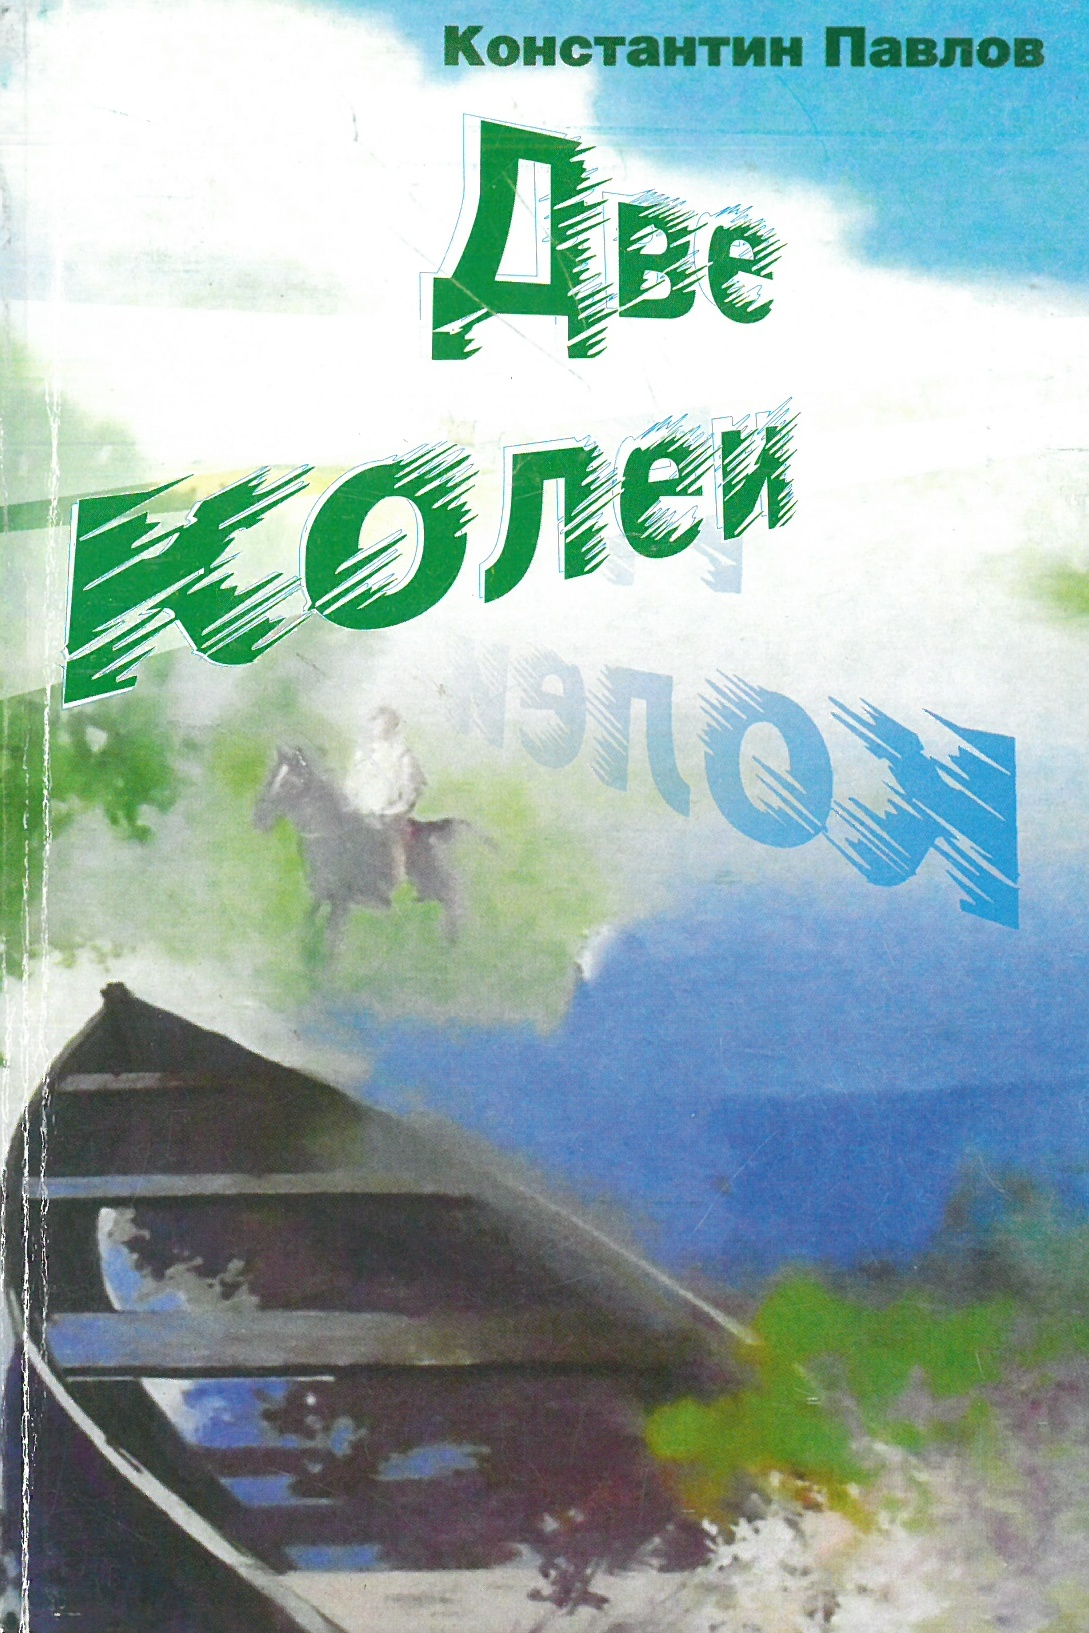 Константин Павлов - Сборник стихов Две Колеи (2004)